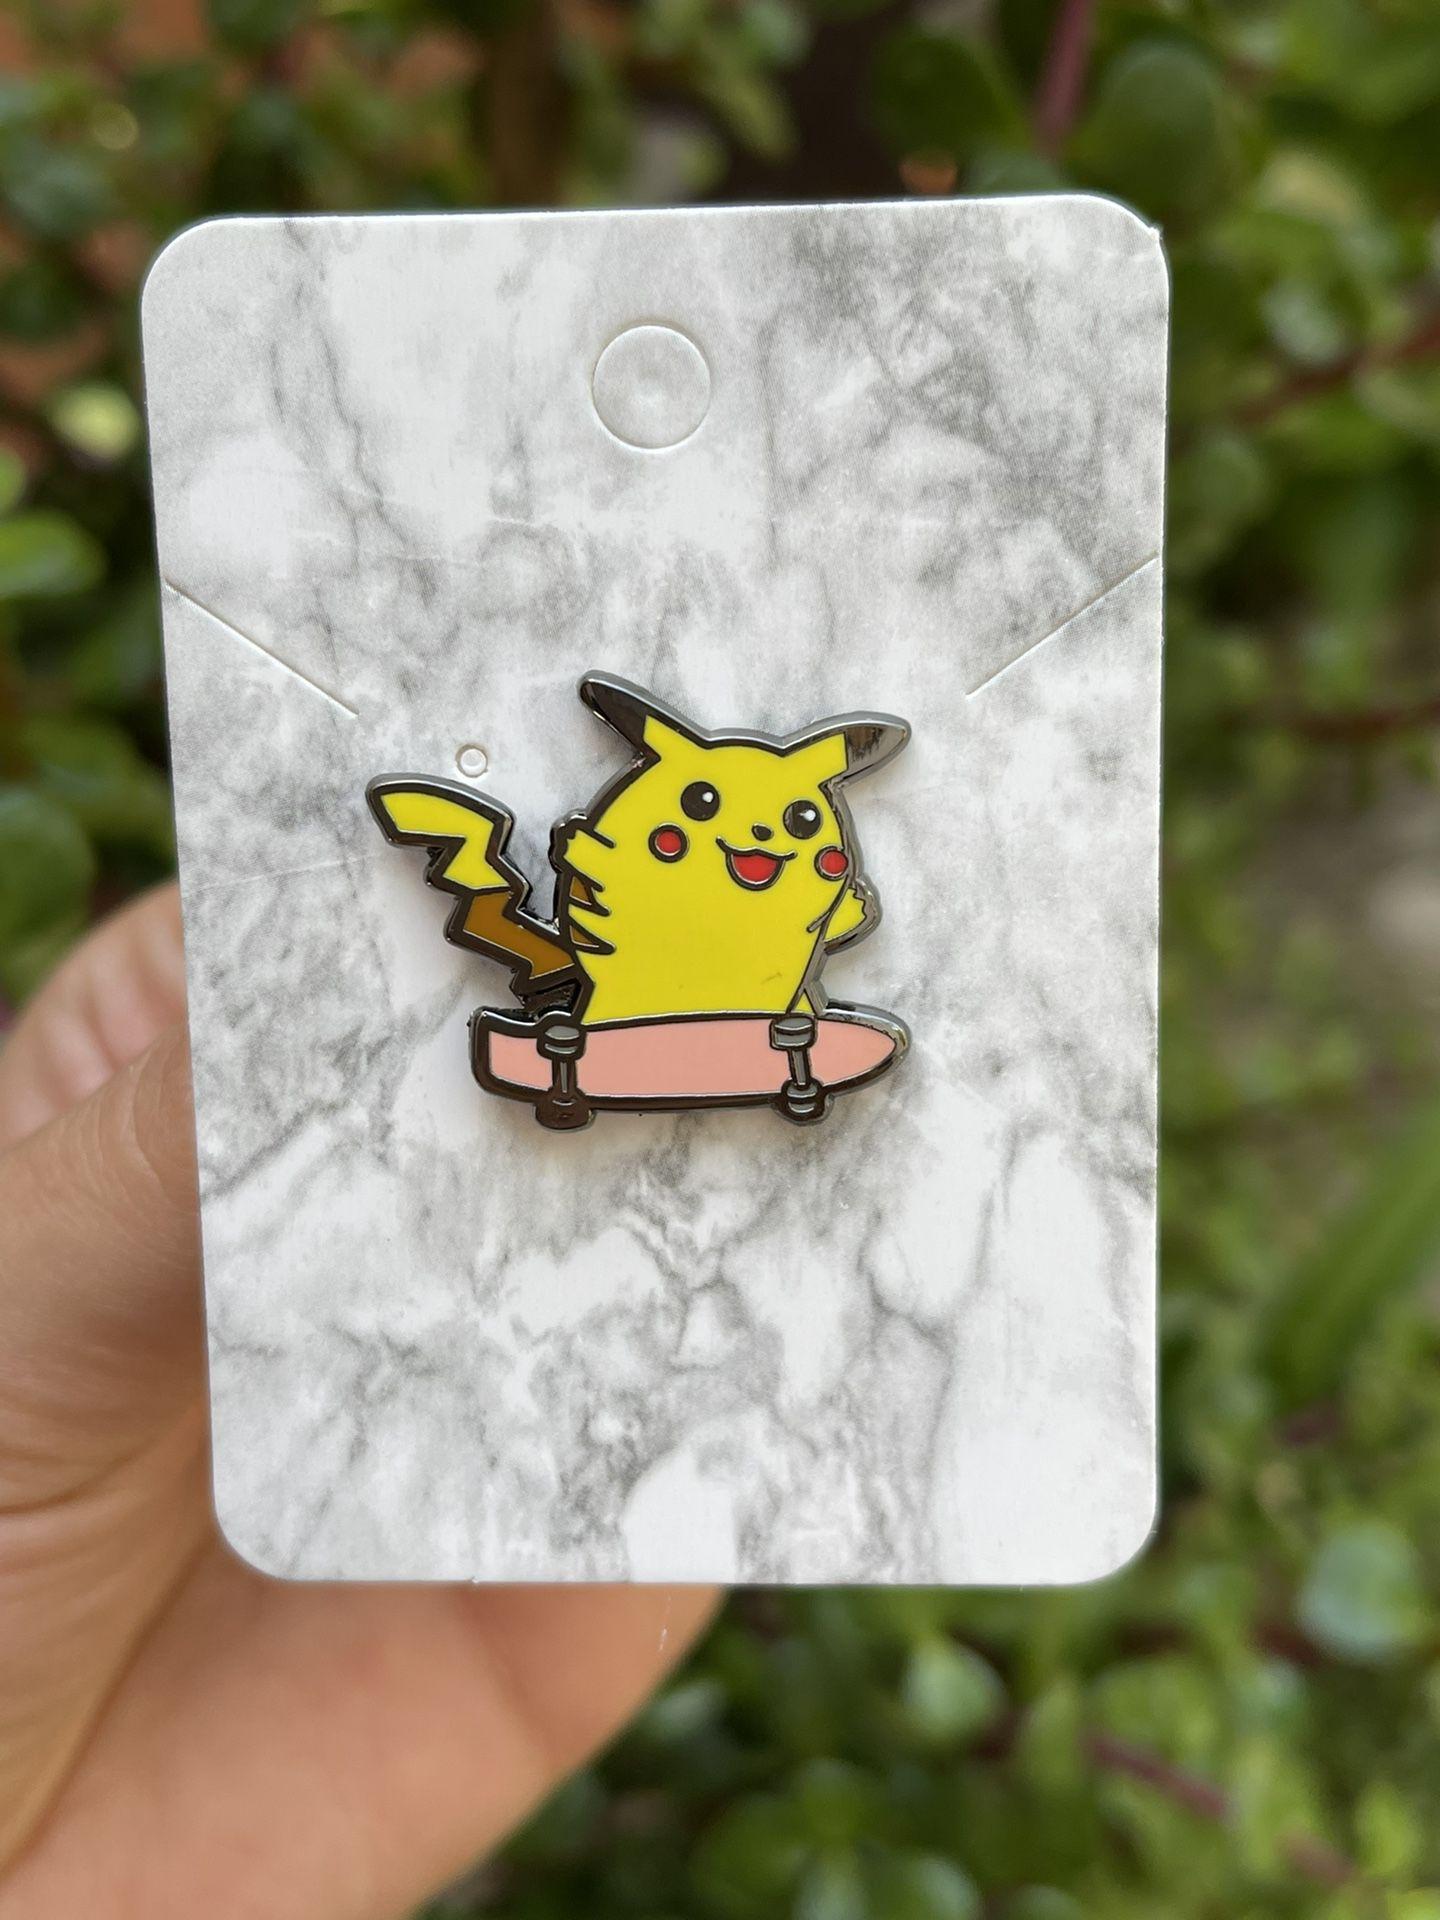 Skateboarding Pikachu Pokemon Pin